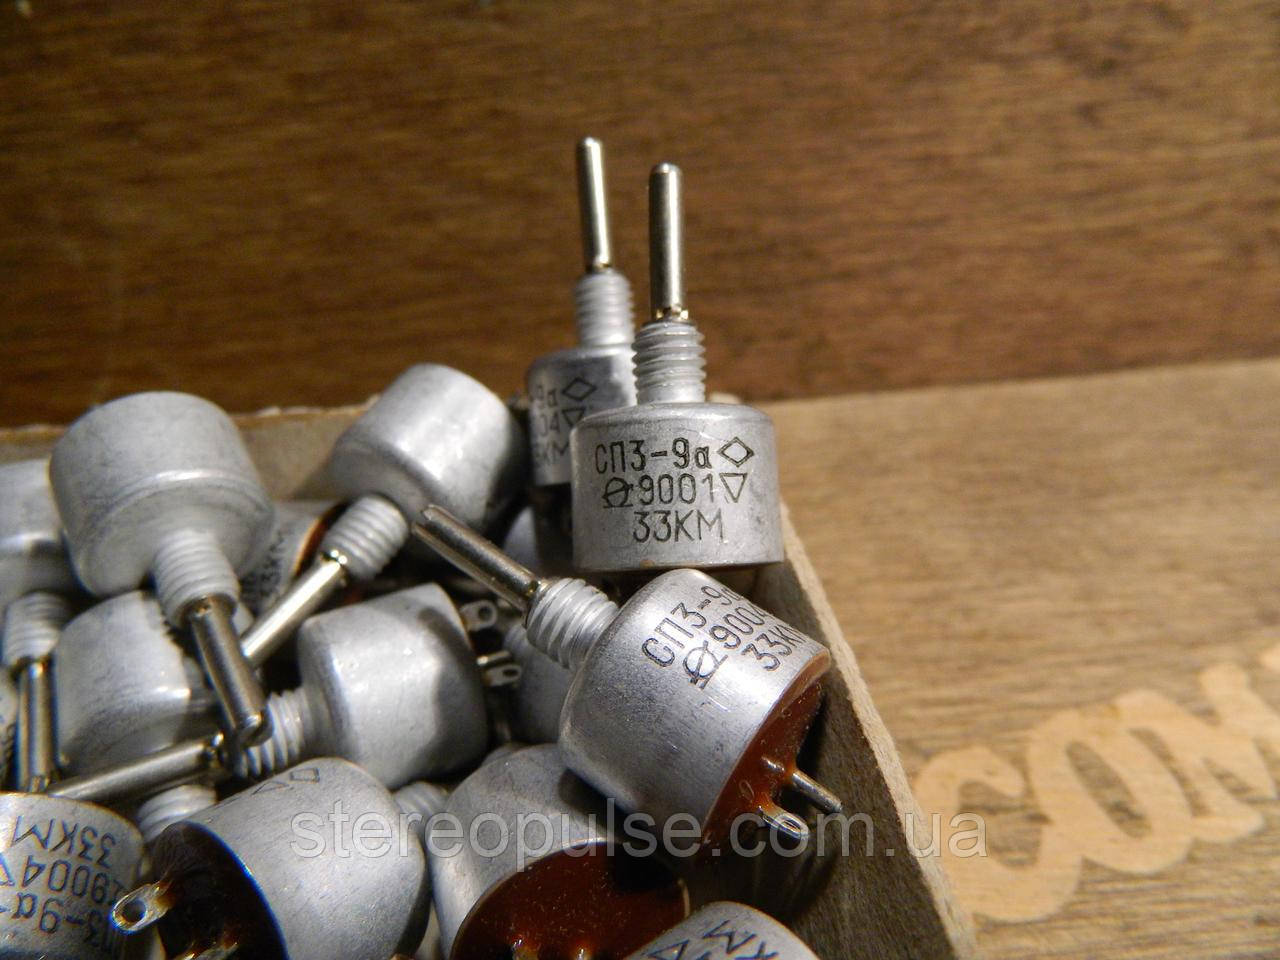 Резистор СП3 - 9А 33кОм